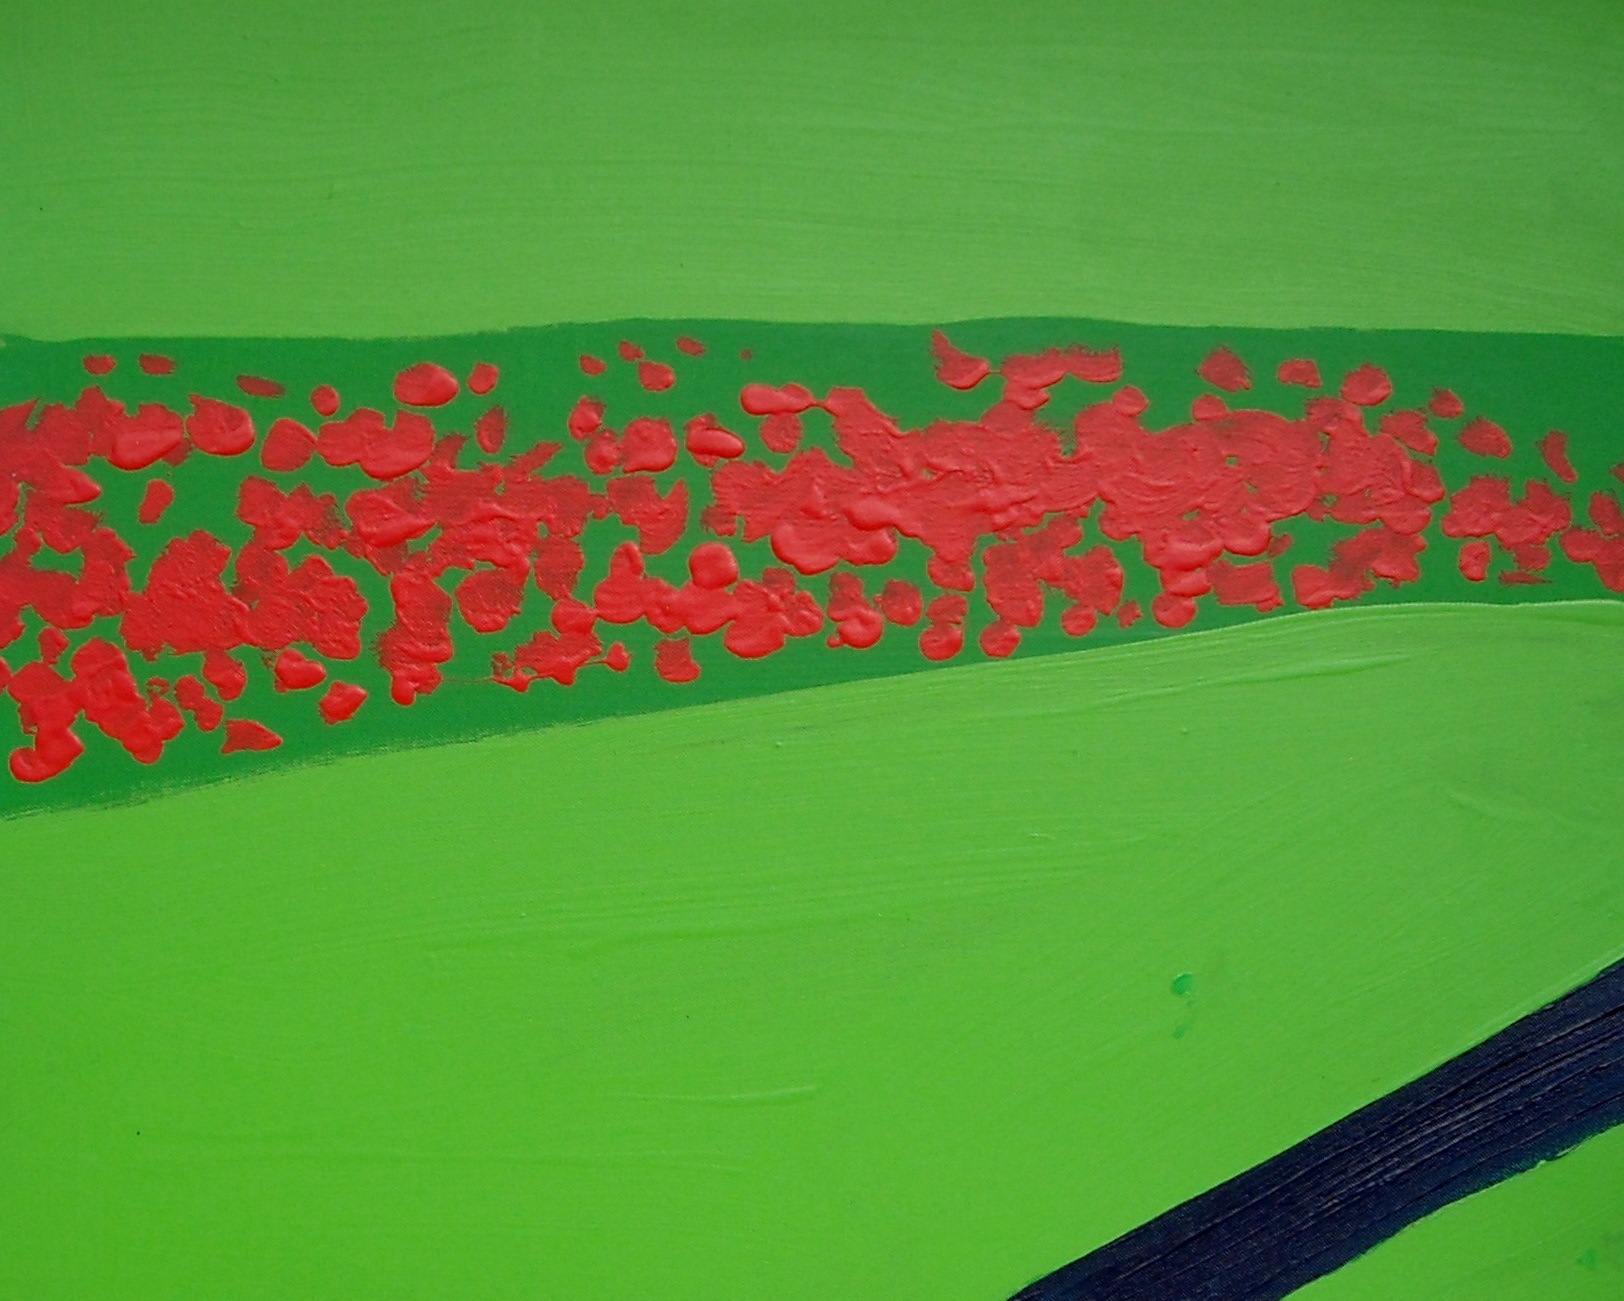 Queen Elizabeth Simple Garden Acrylic on canvas 59 X 50cm Yaniv Janson.JPG